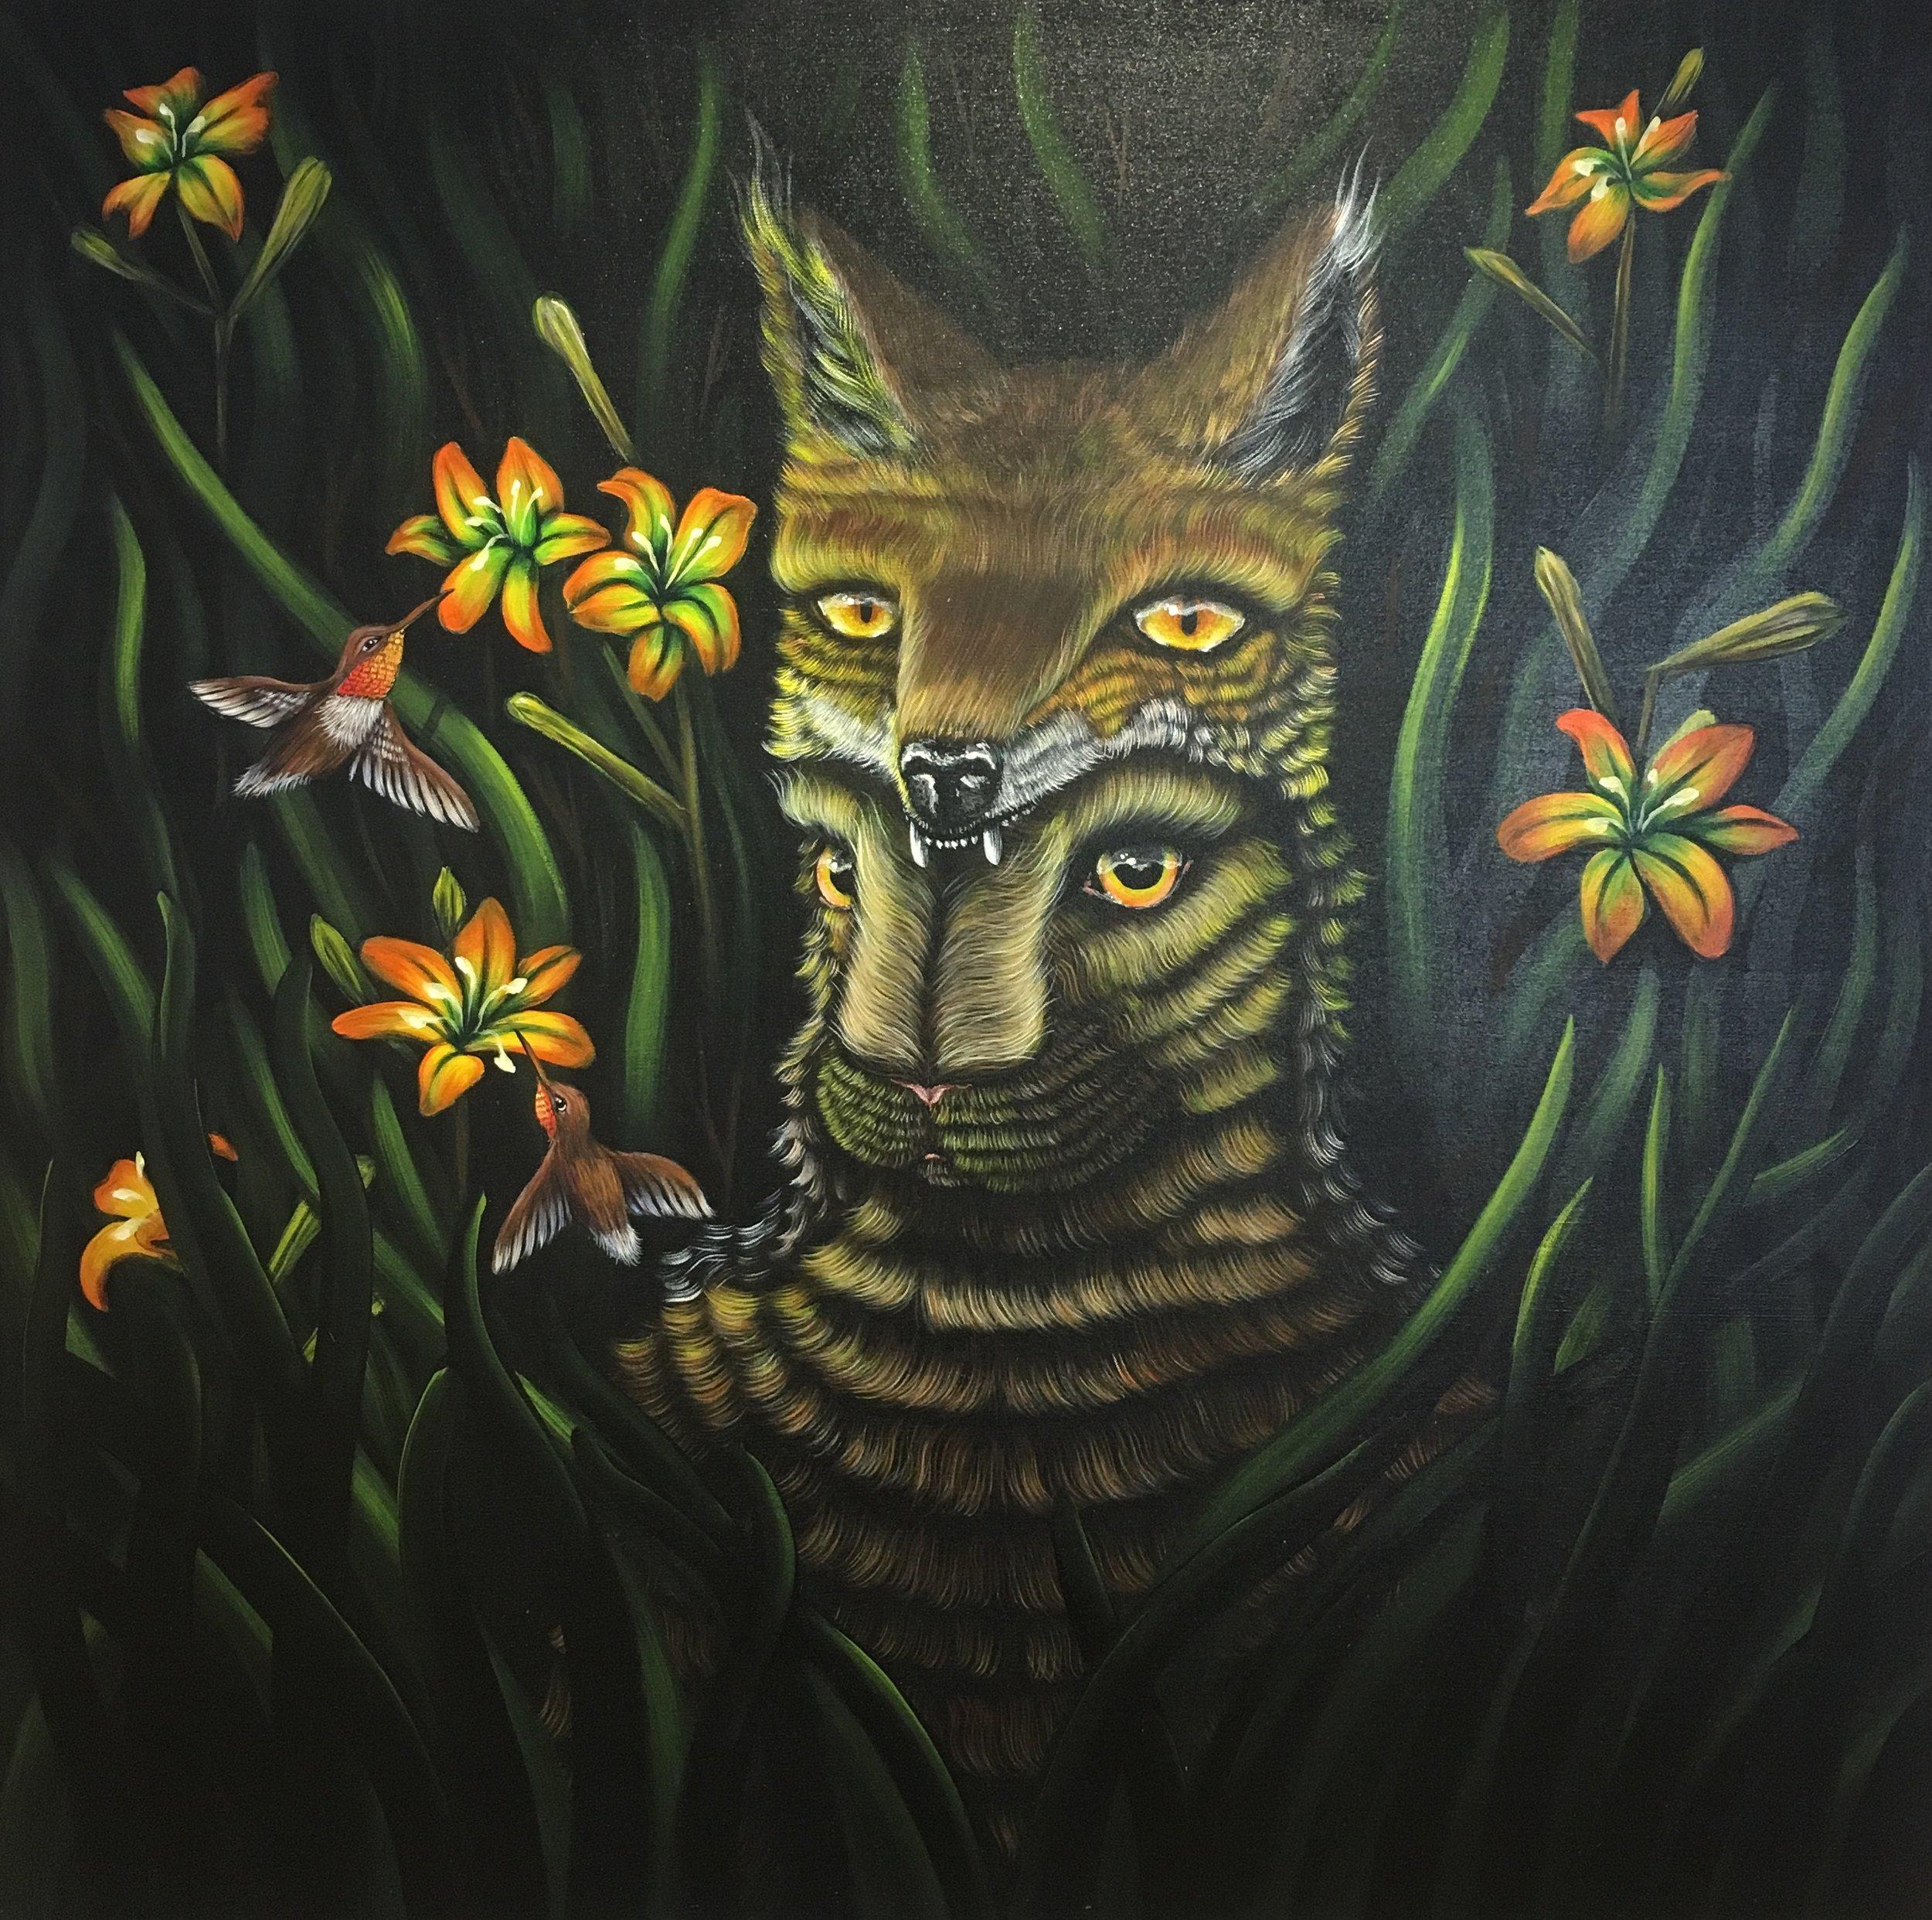 Undercover_40x40_acrylic on canvas.JPG